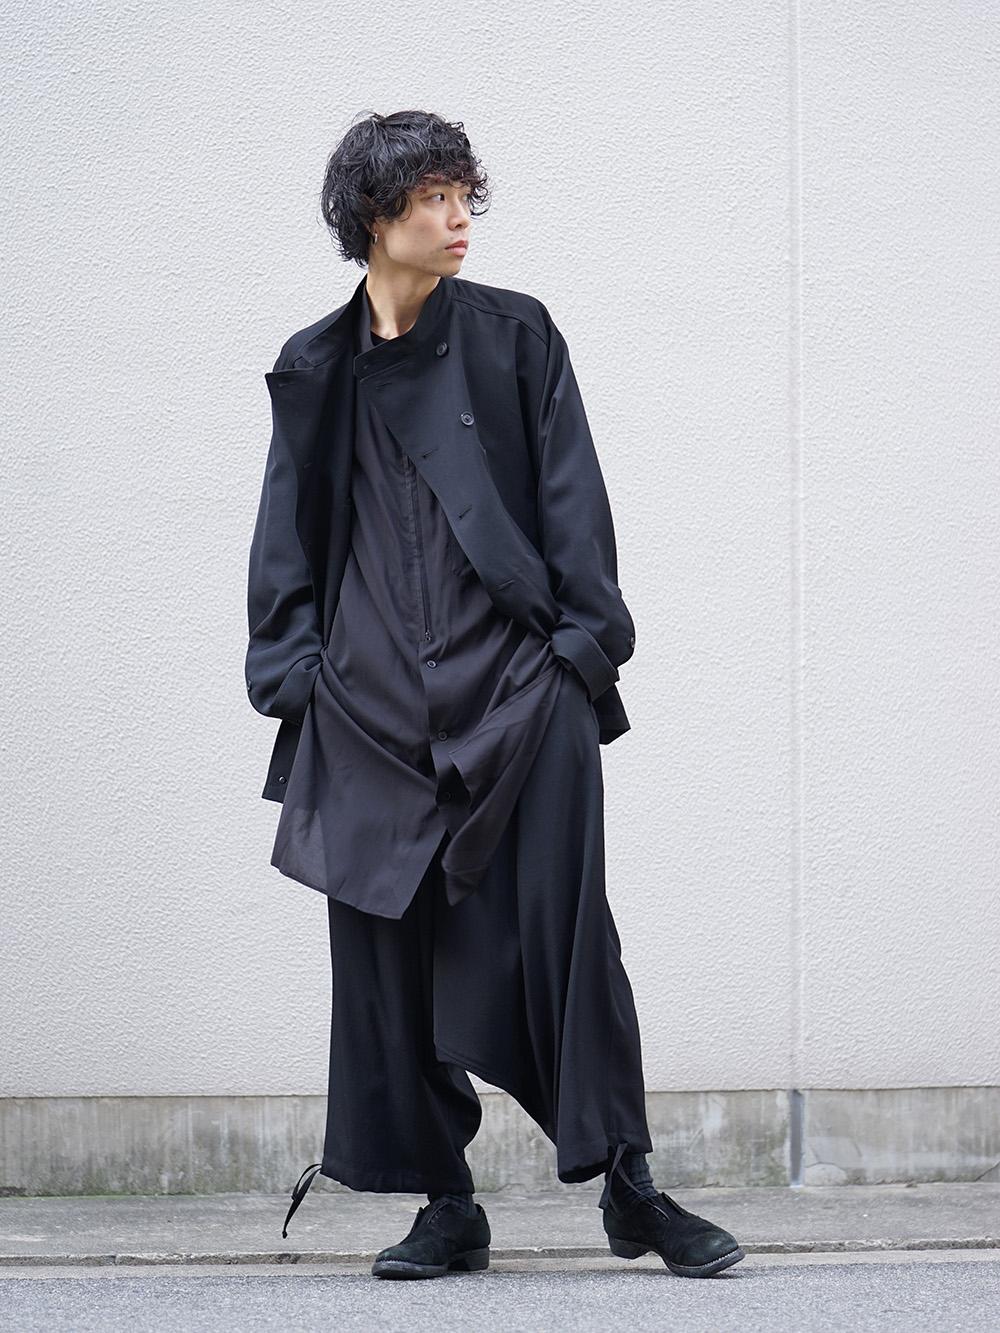 Yohji Yamamoto 2019 Spring Summer New Arrival